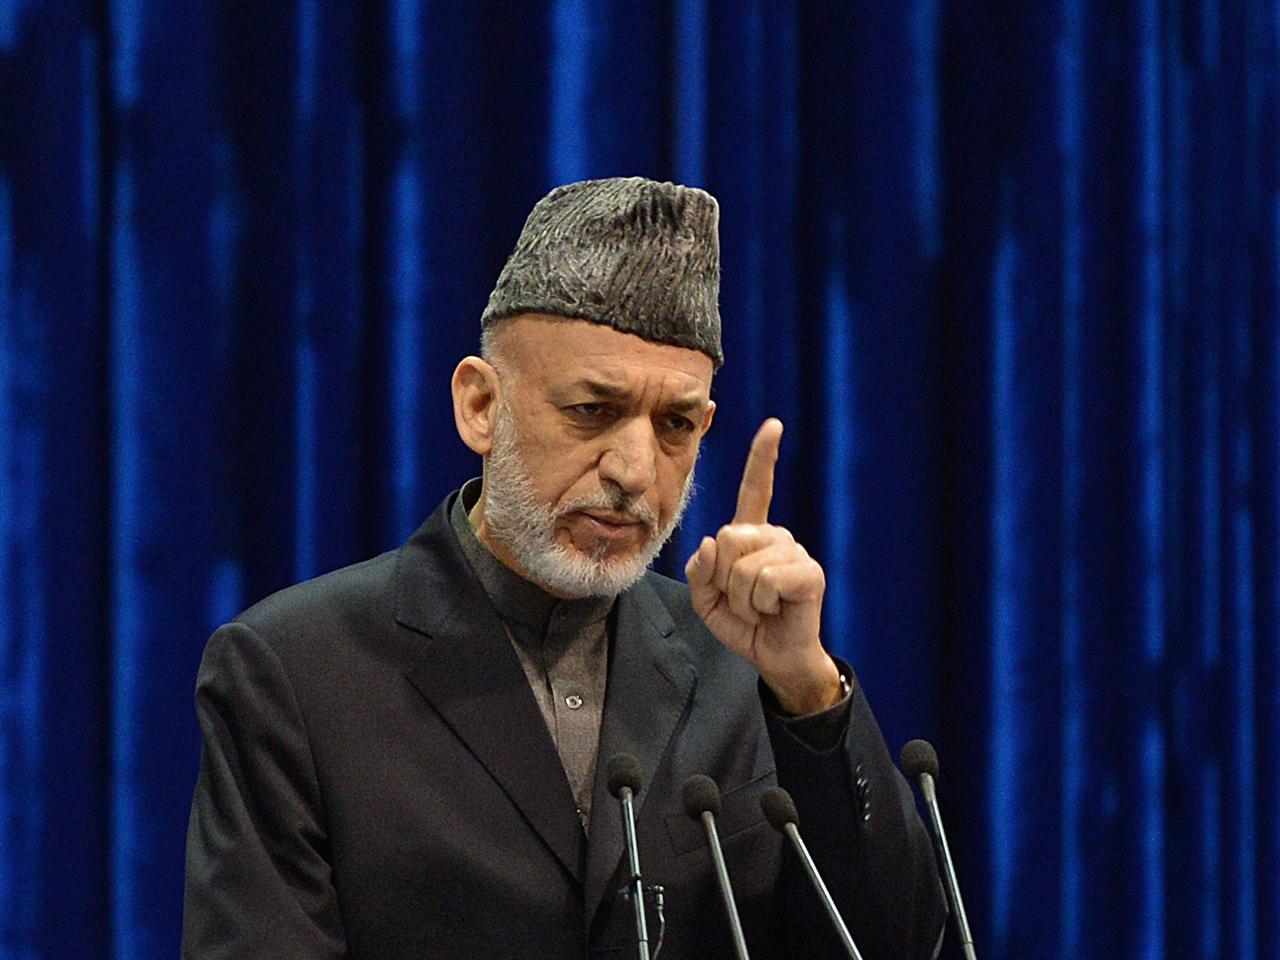 Afghanistan President Karzai in dangerous game of chicken